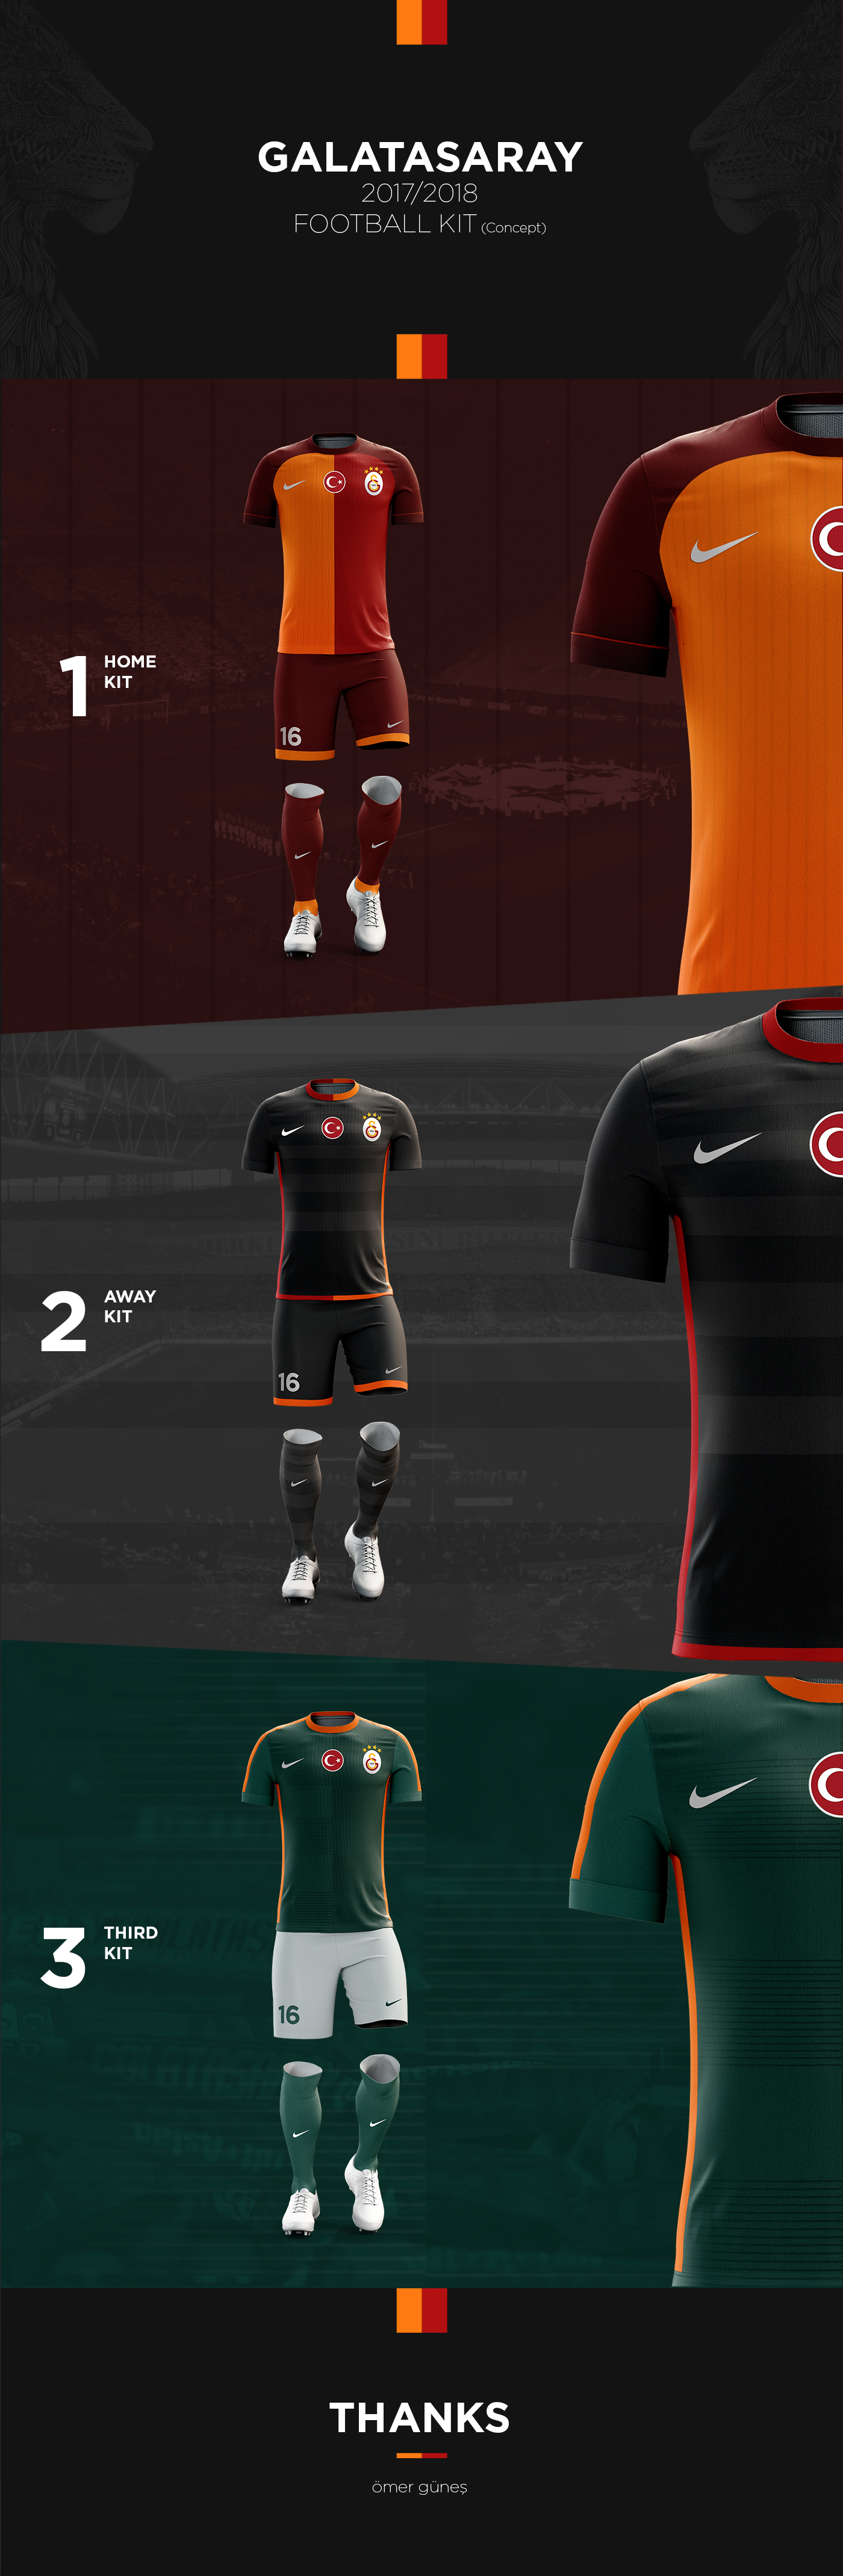 Galatasaray 2017-2018 Football Kit (Concept Design) on Behance